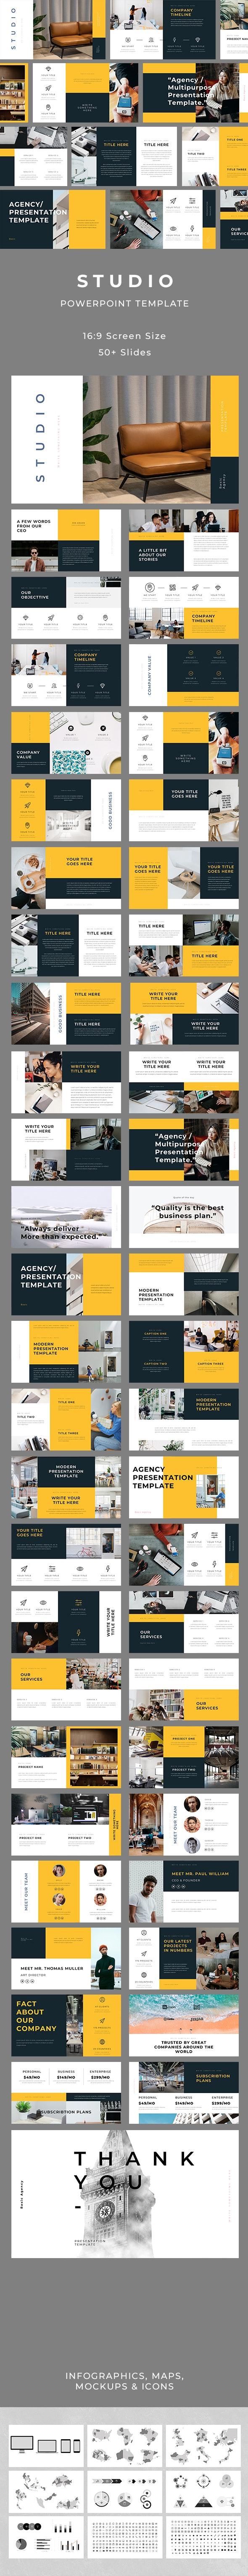 Studio PowerPoint - Business PowerPoint Templates